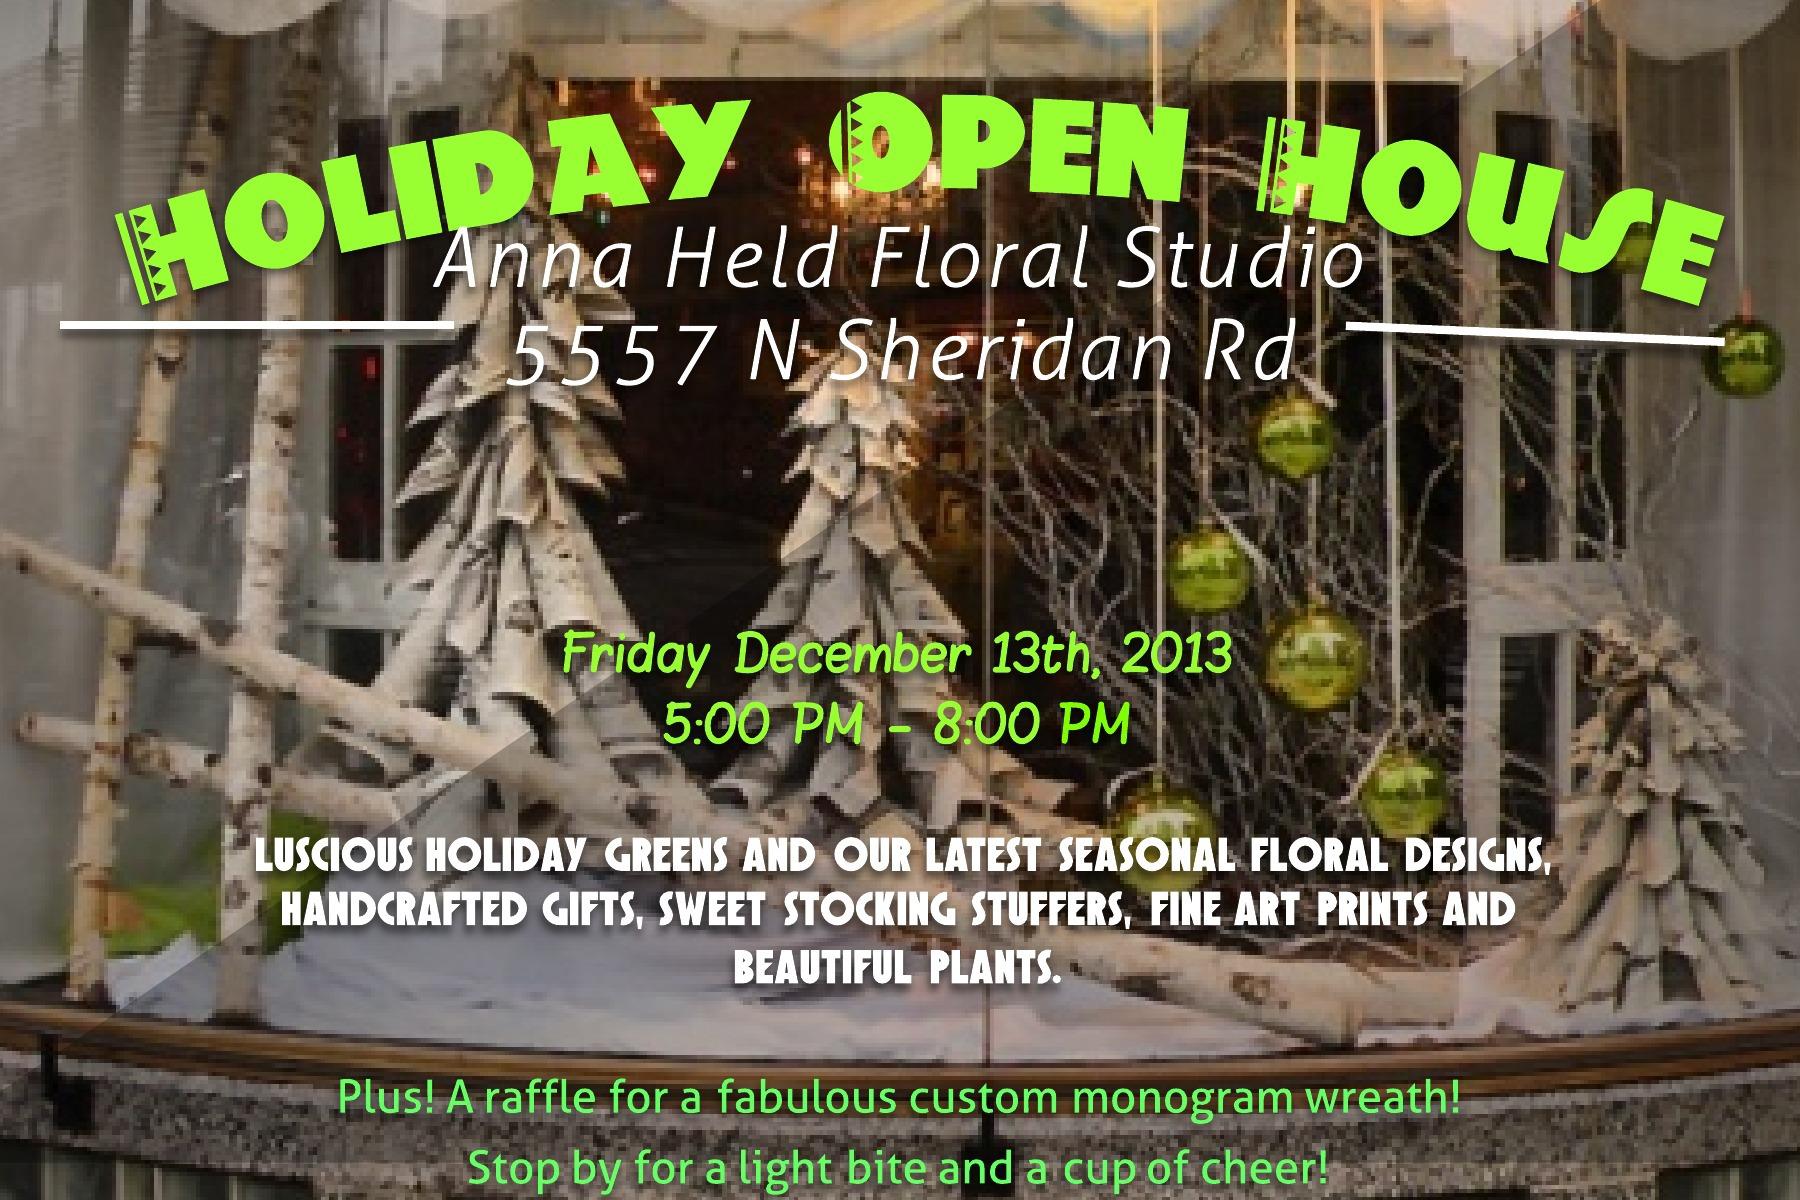 holiday open house - Invitation.jpeg